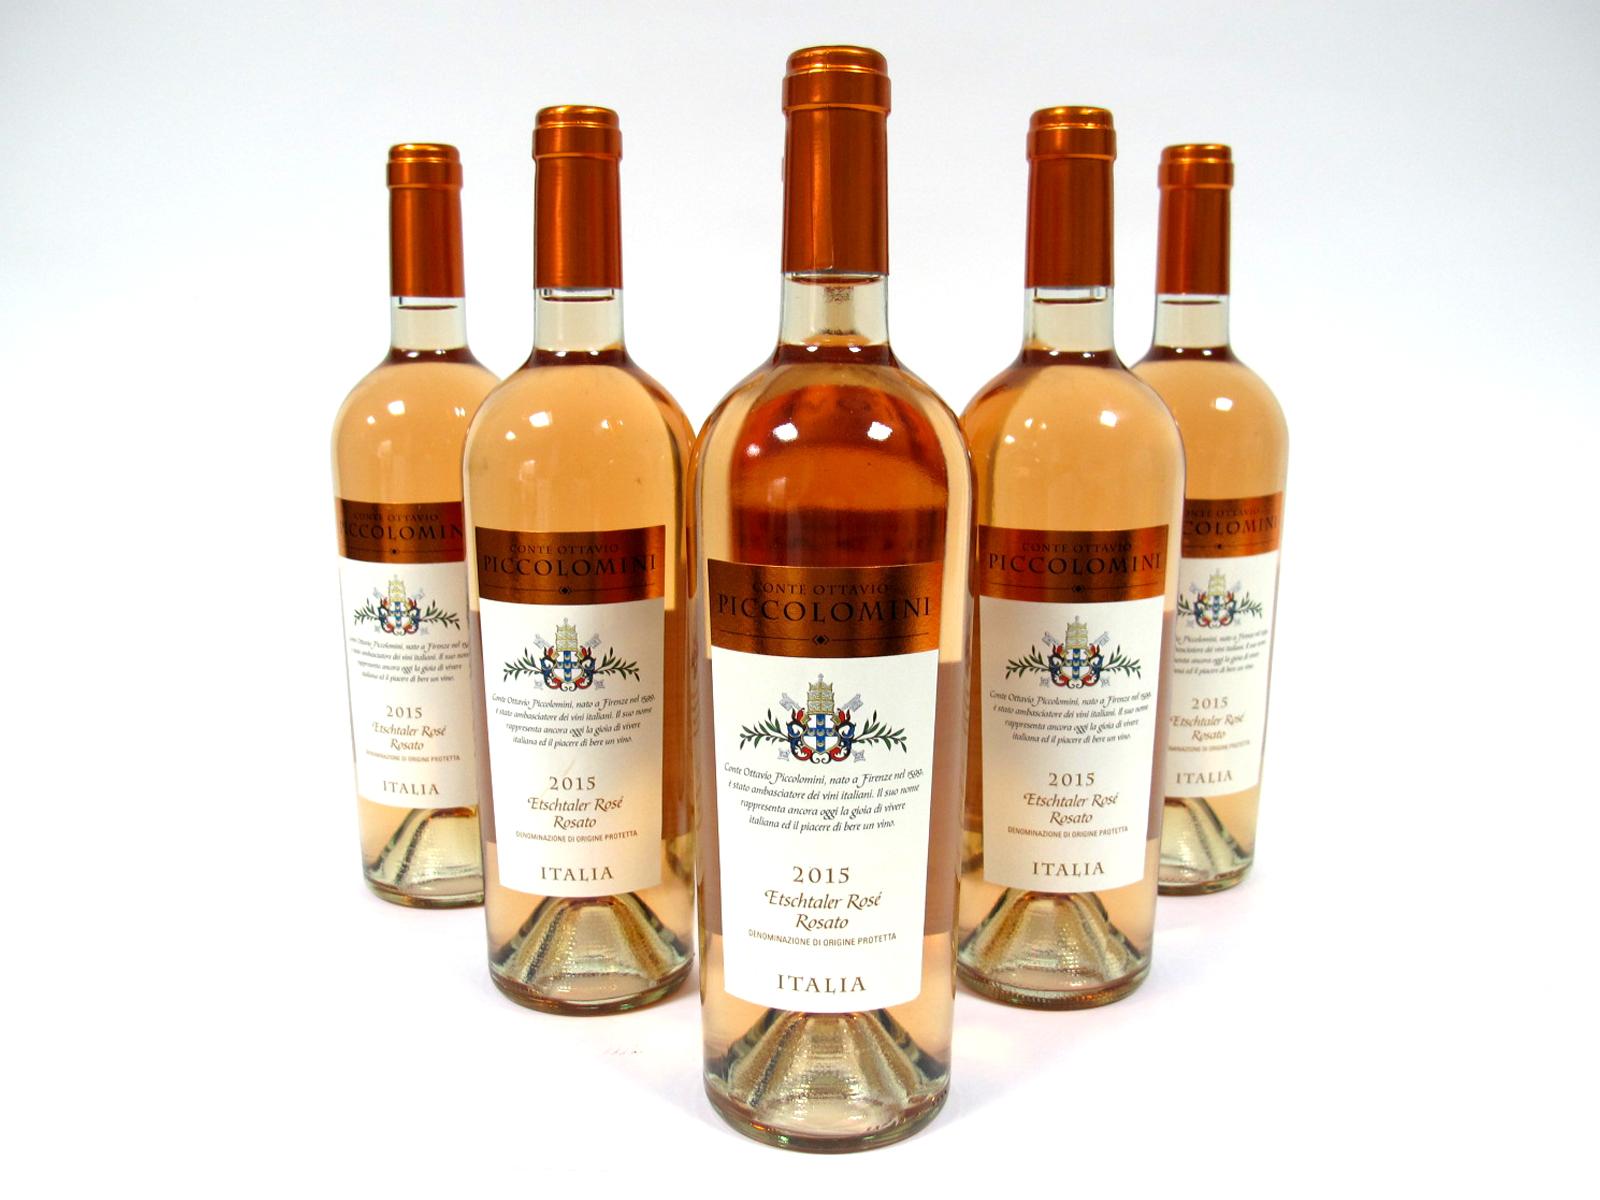 Lot 19 - Wine - Conte Ottavio Piccolomini Etschtaler Rose 2015, 0.75l, 11% Vol. six bottles. (6)